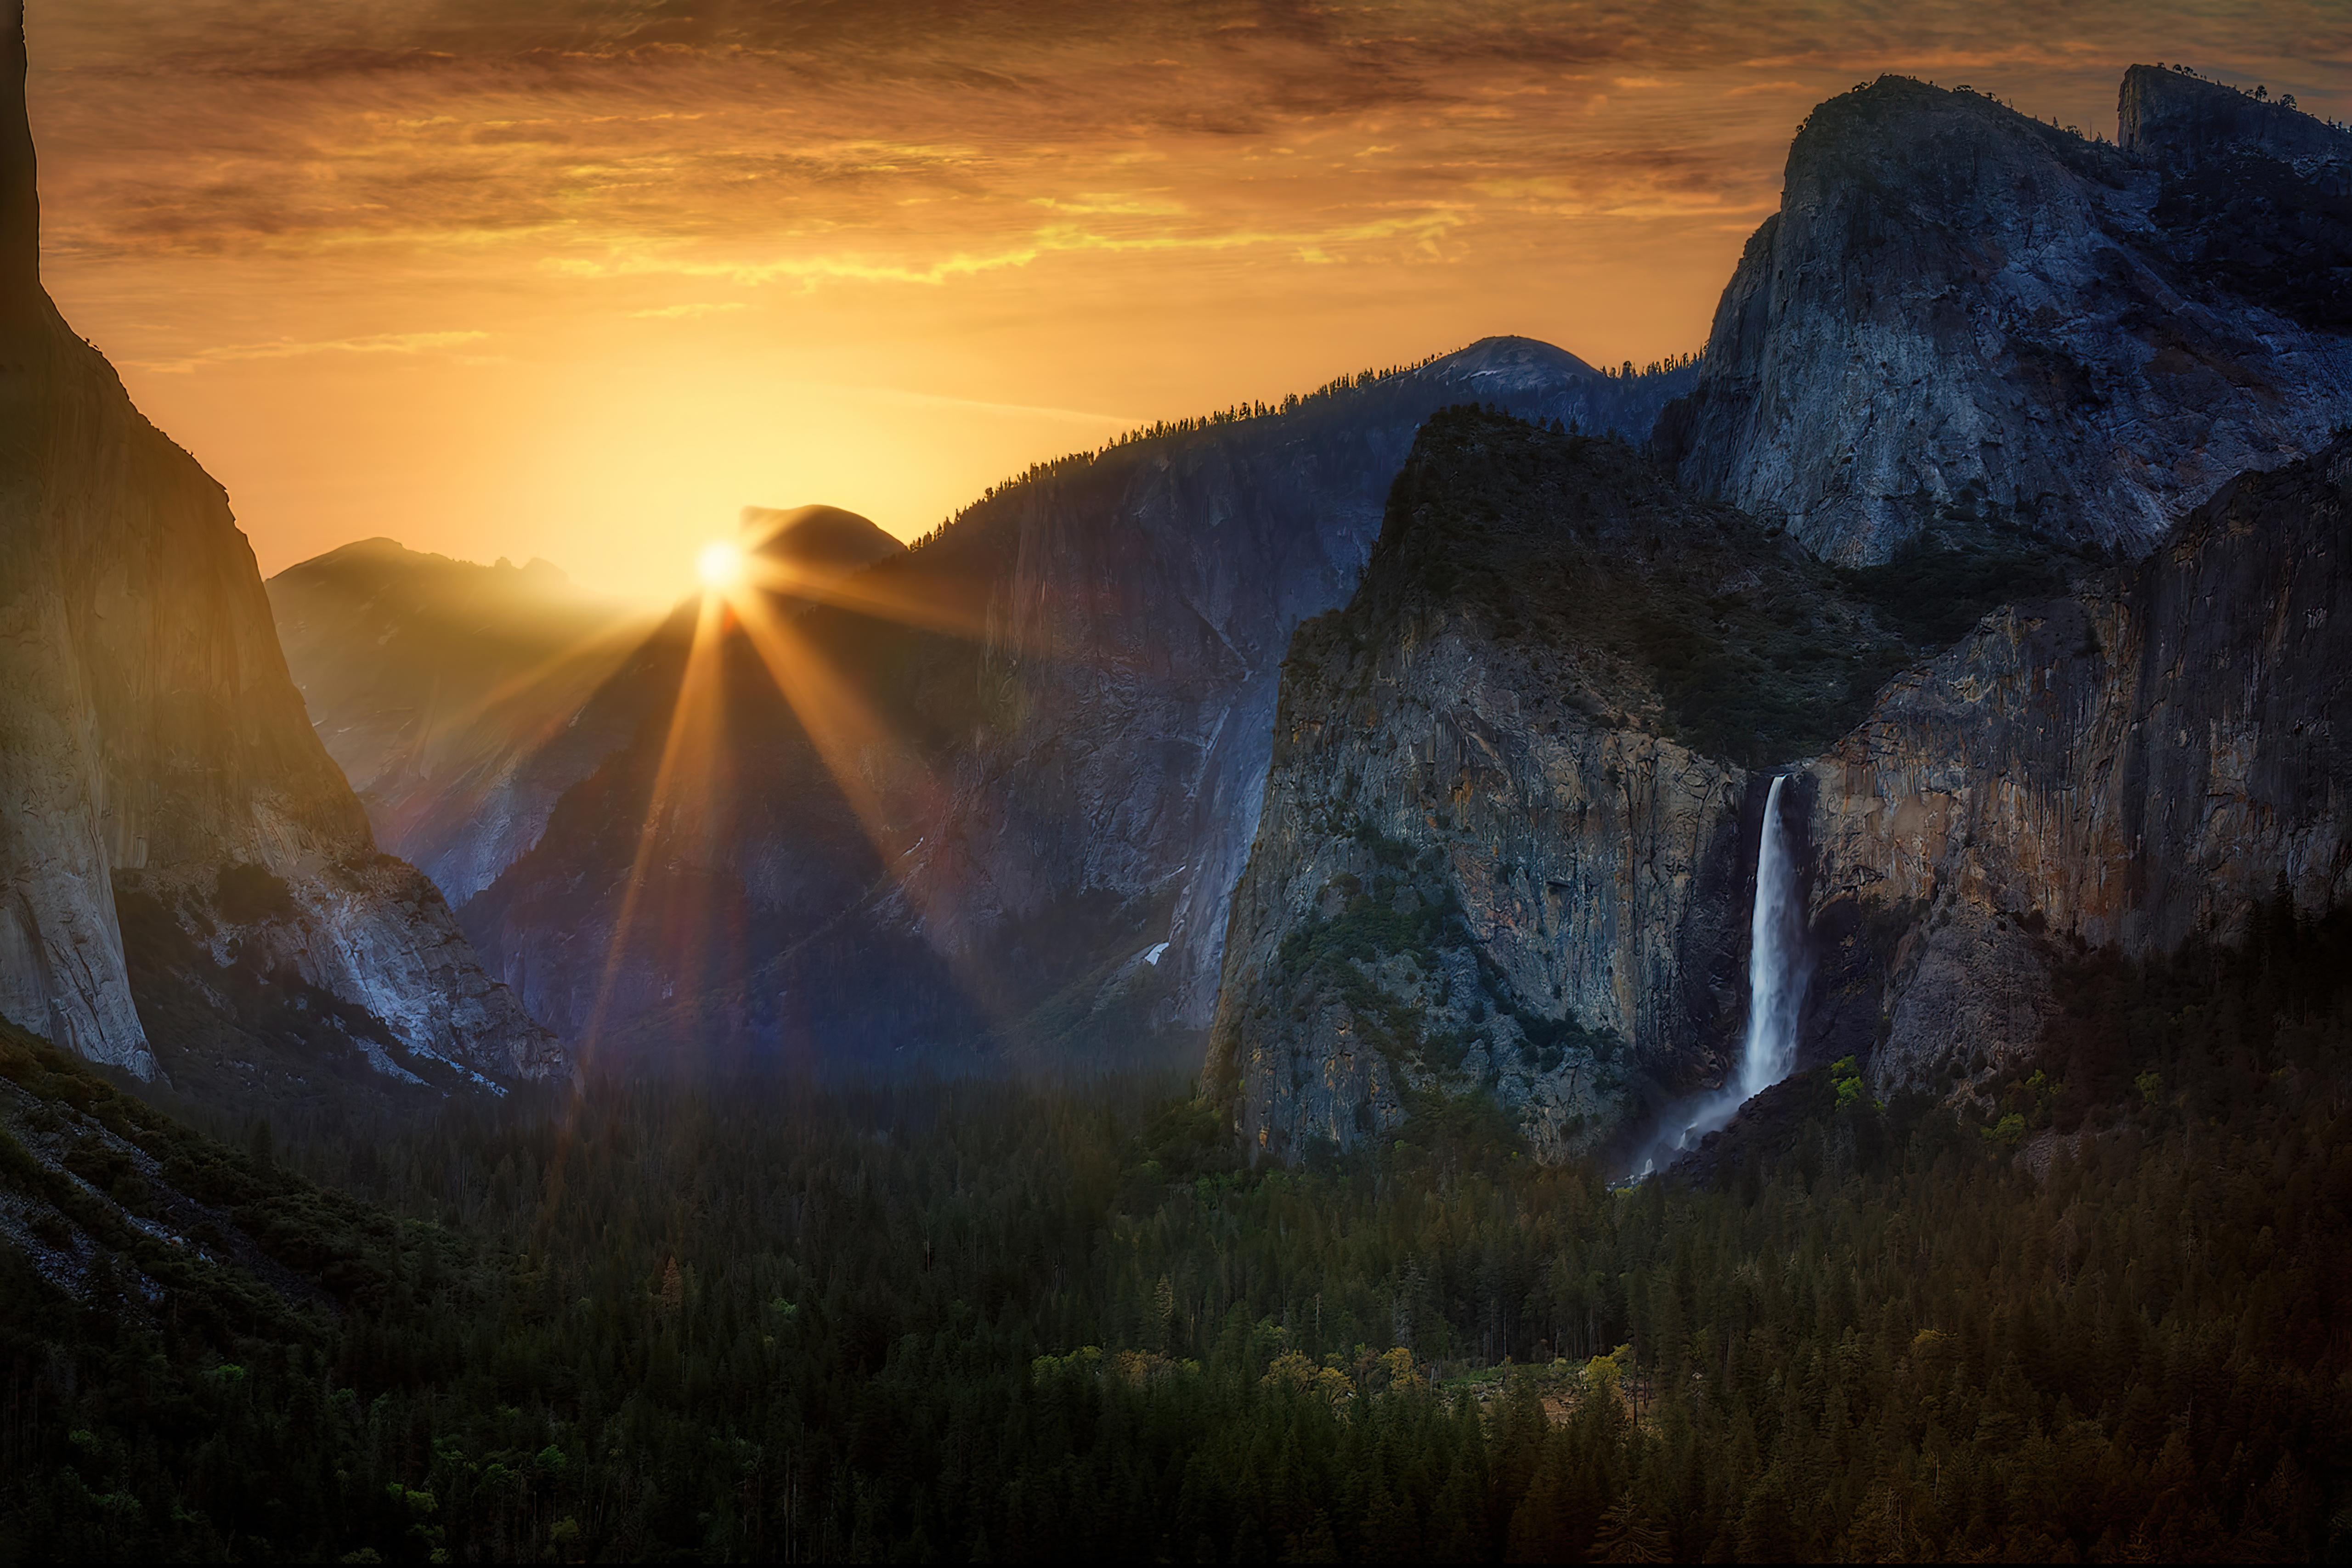 Wallpaper Sunrise at Yosemite National Park